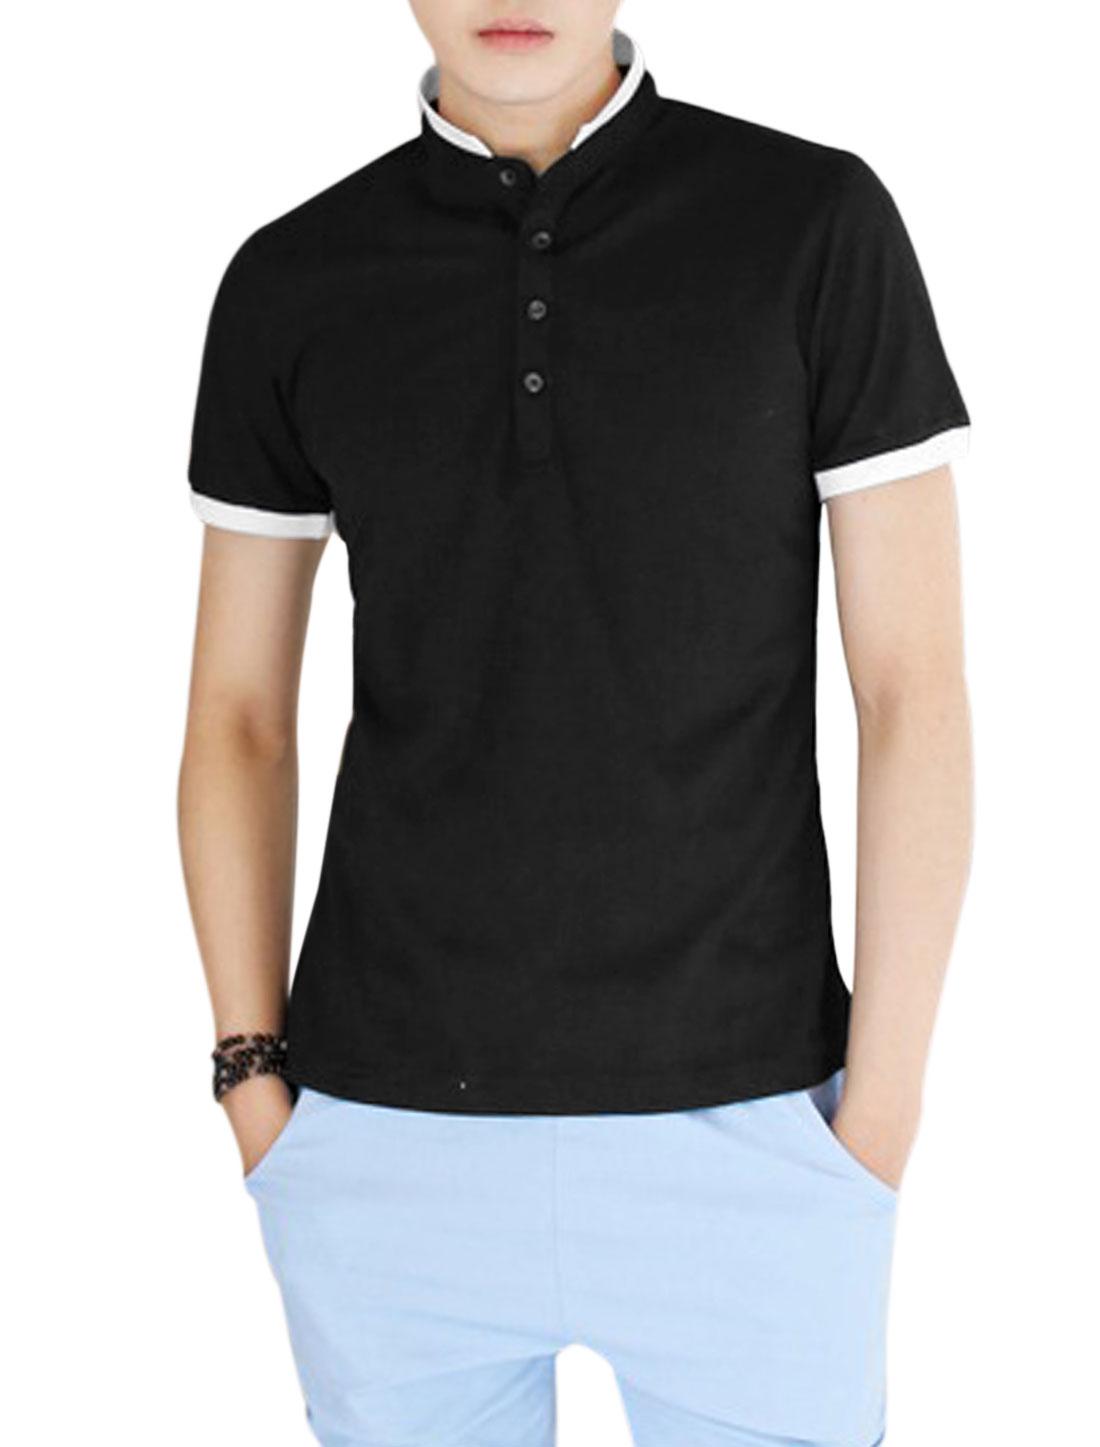 Man 3/4 Placket Convertible Collar Trendy Slim Polo Shirt Black S